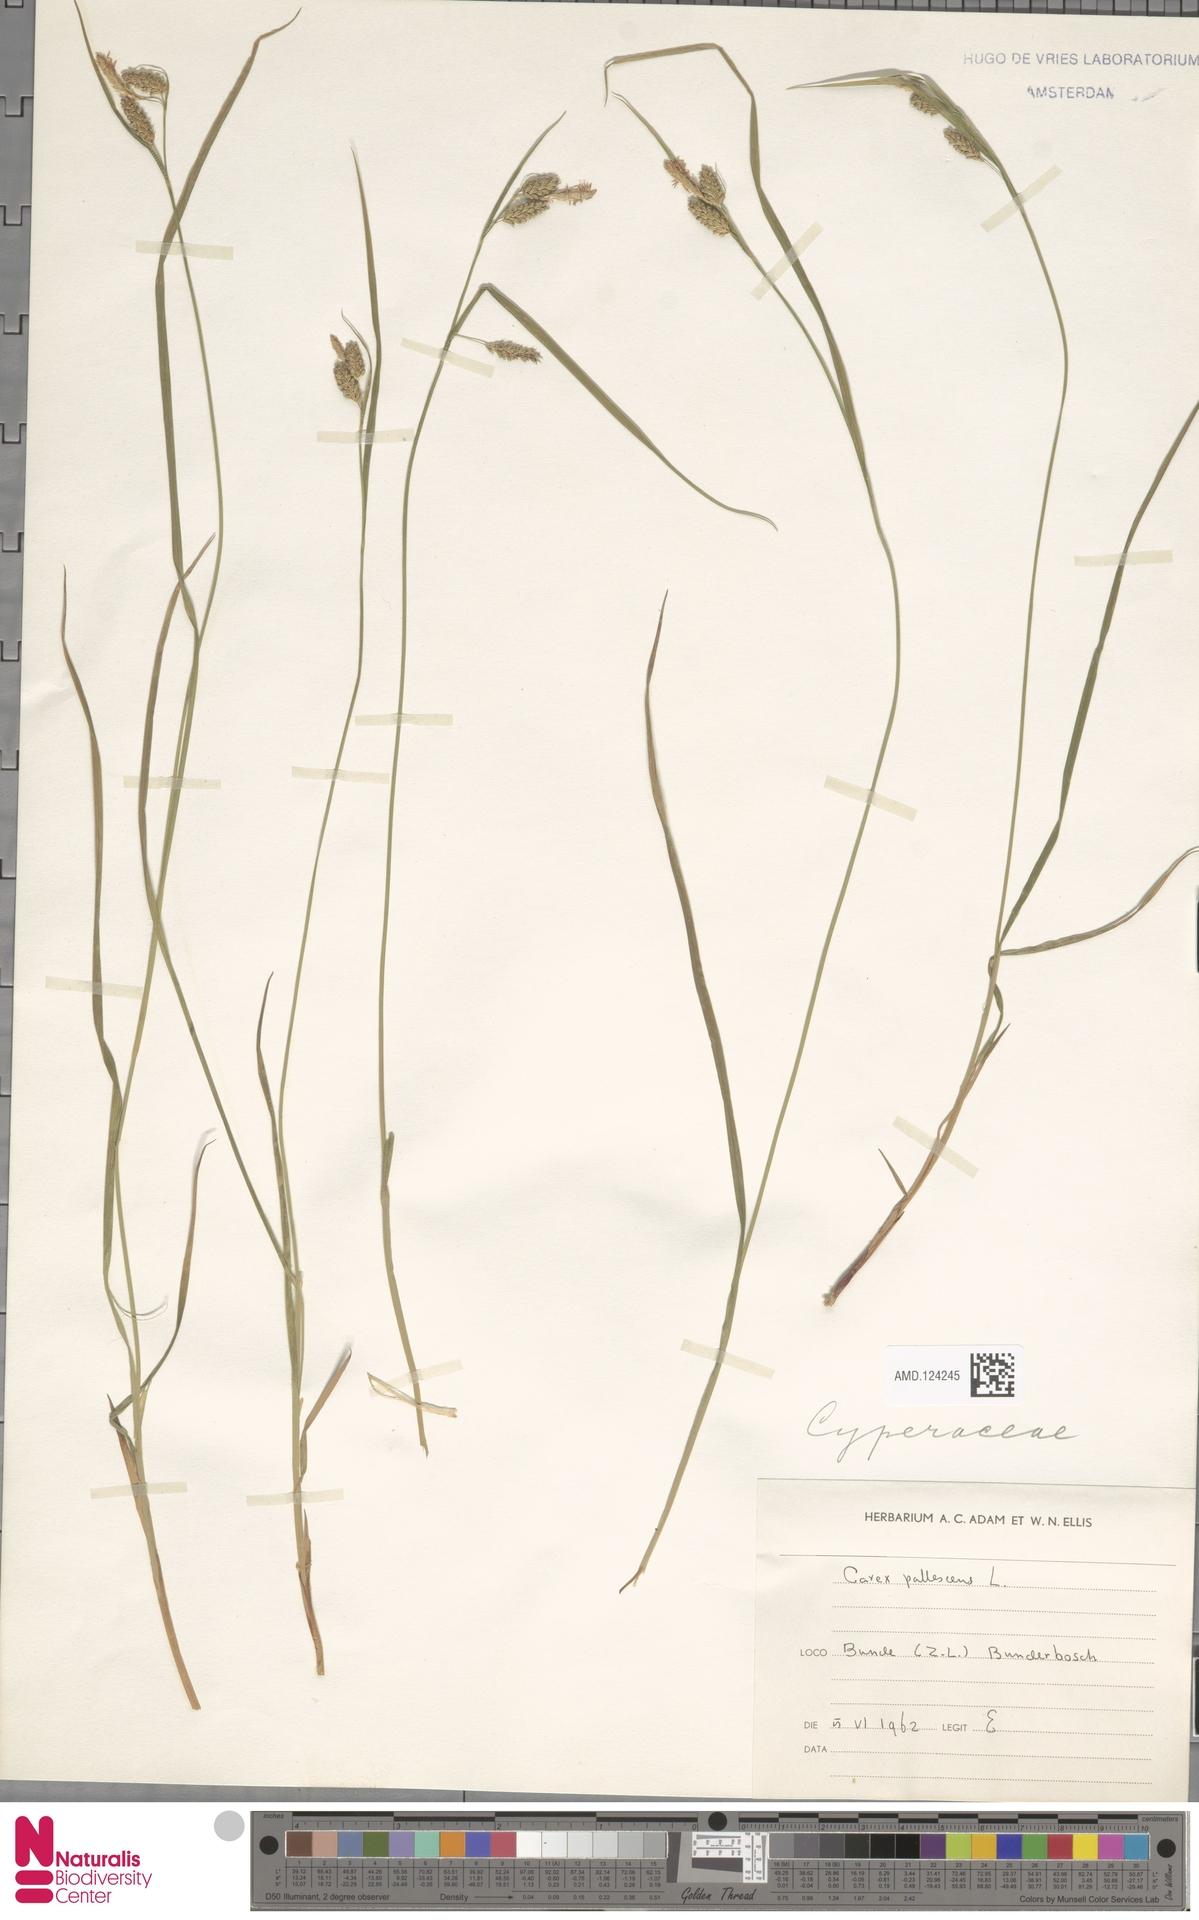 AMD.124245 | Carex pallescens L.